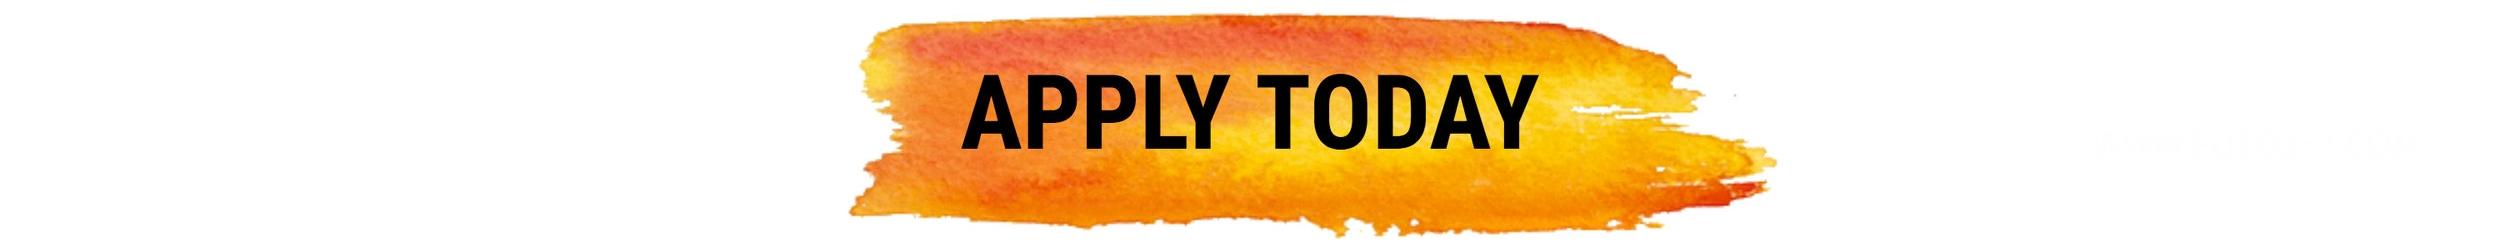 apply today.jpg